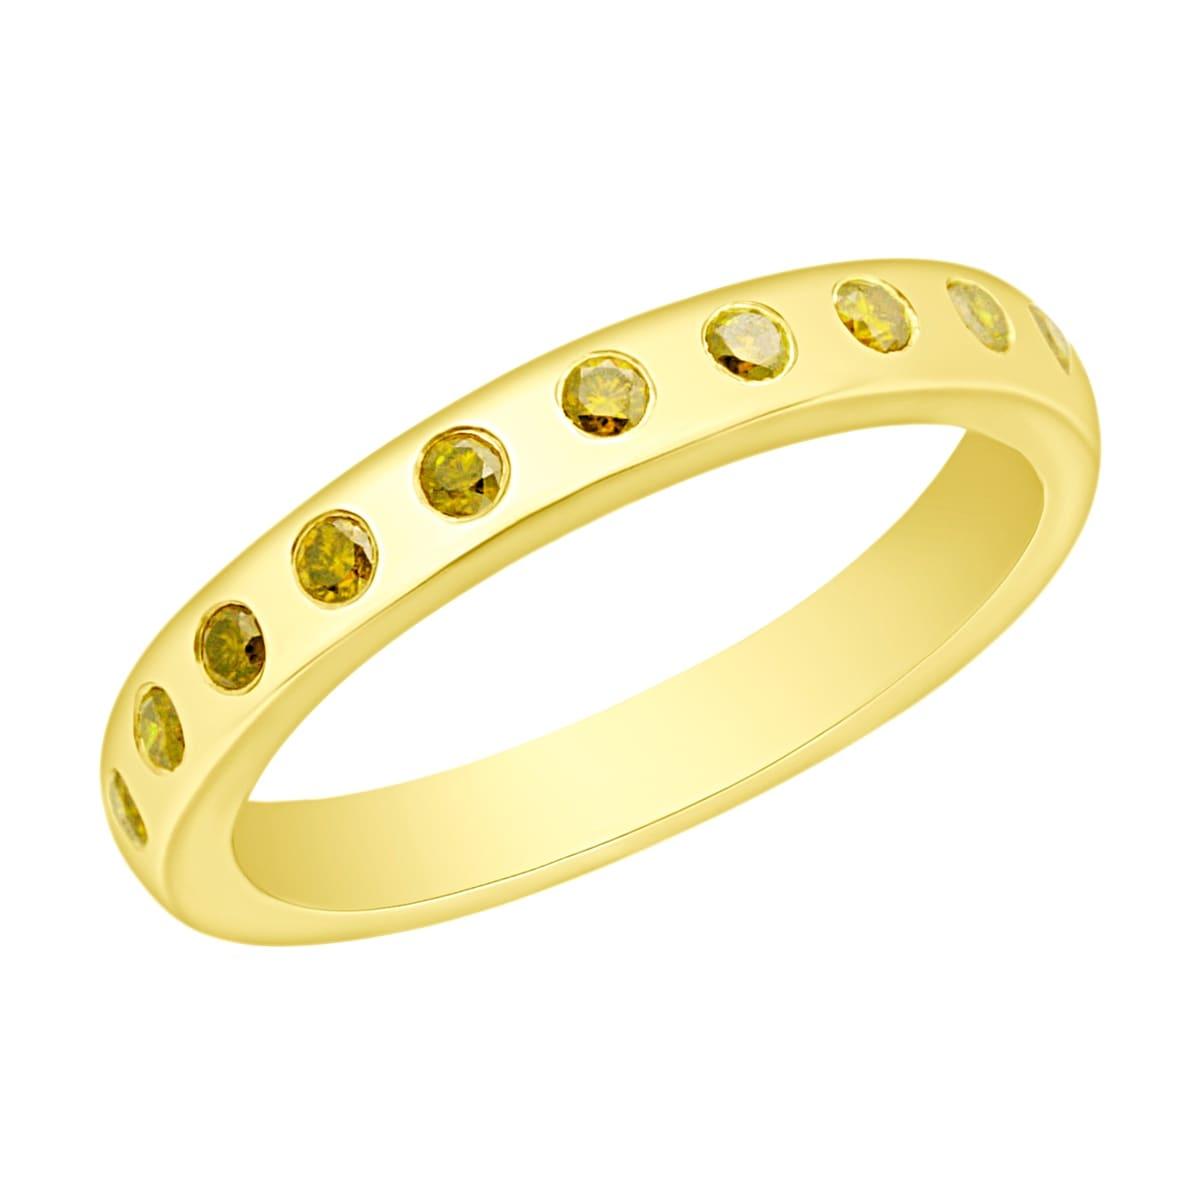 Prism Jewel 0.25CT Flush Set Round Cut Yellow Diamond Wedding Band - Thumbnail 0